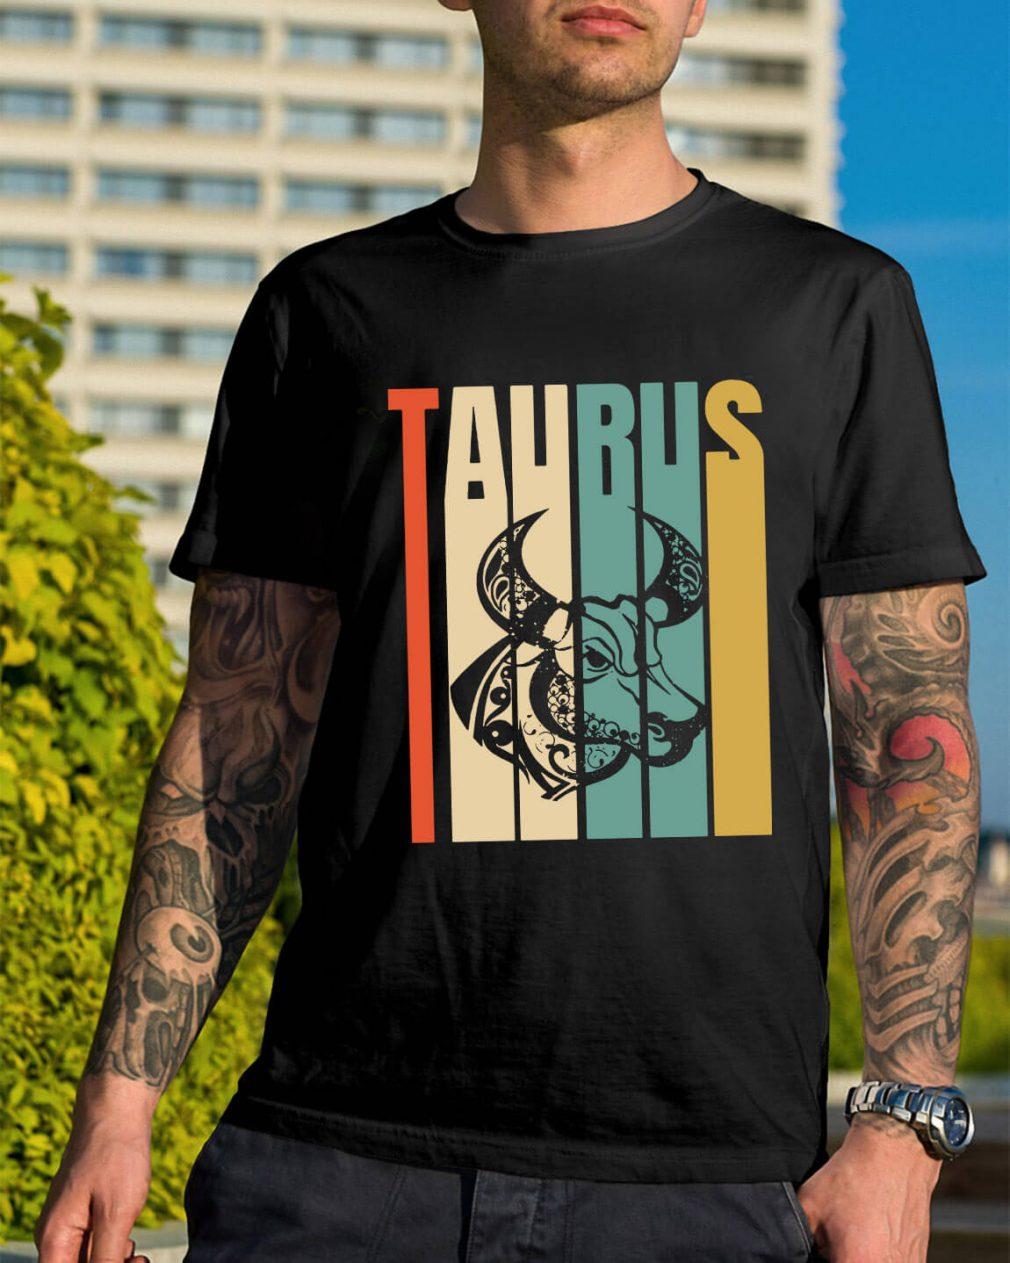 Retro vintage Taurus shirt